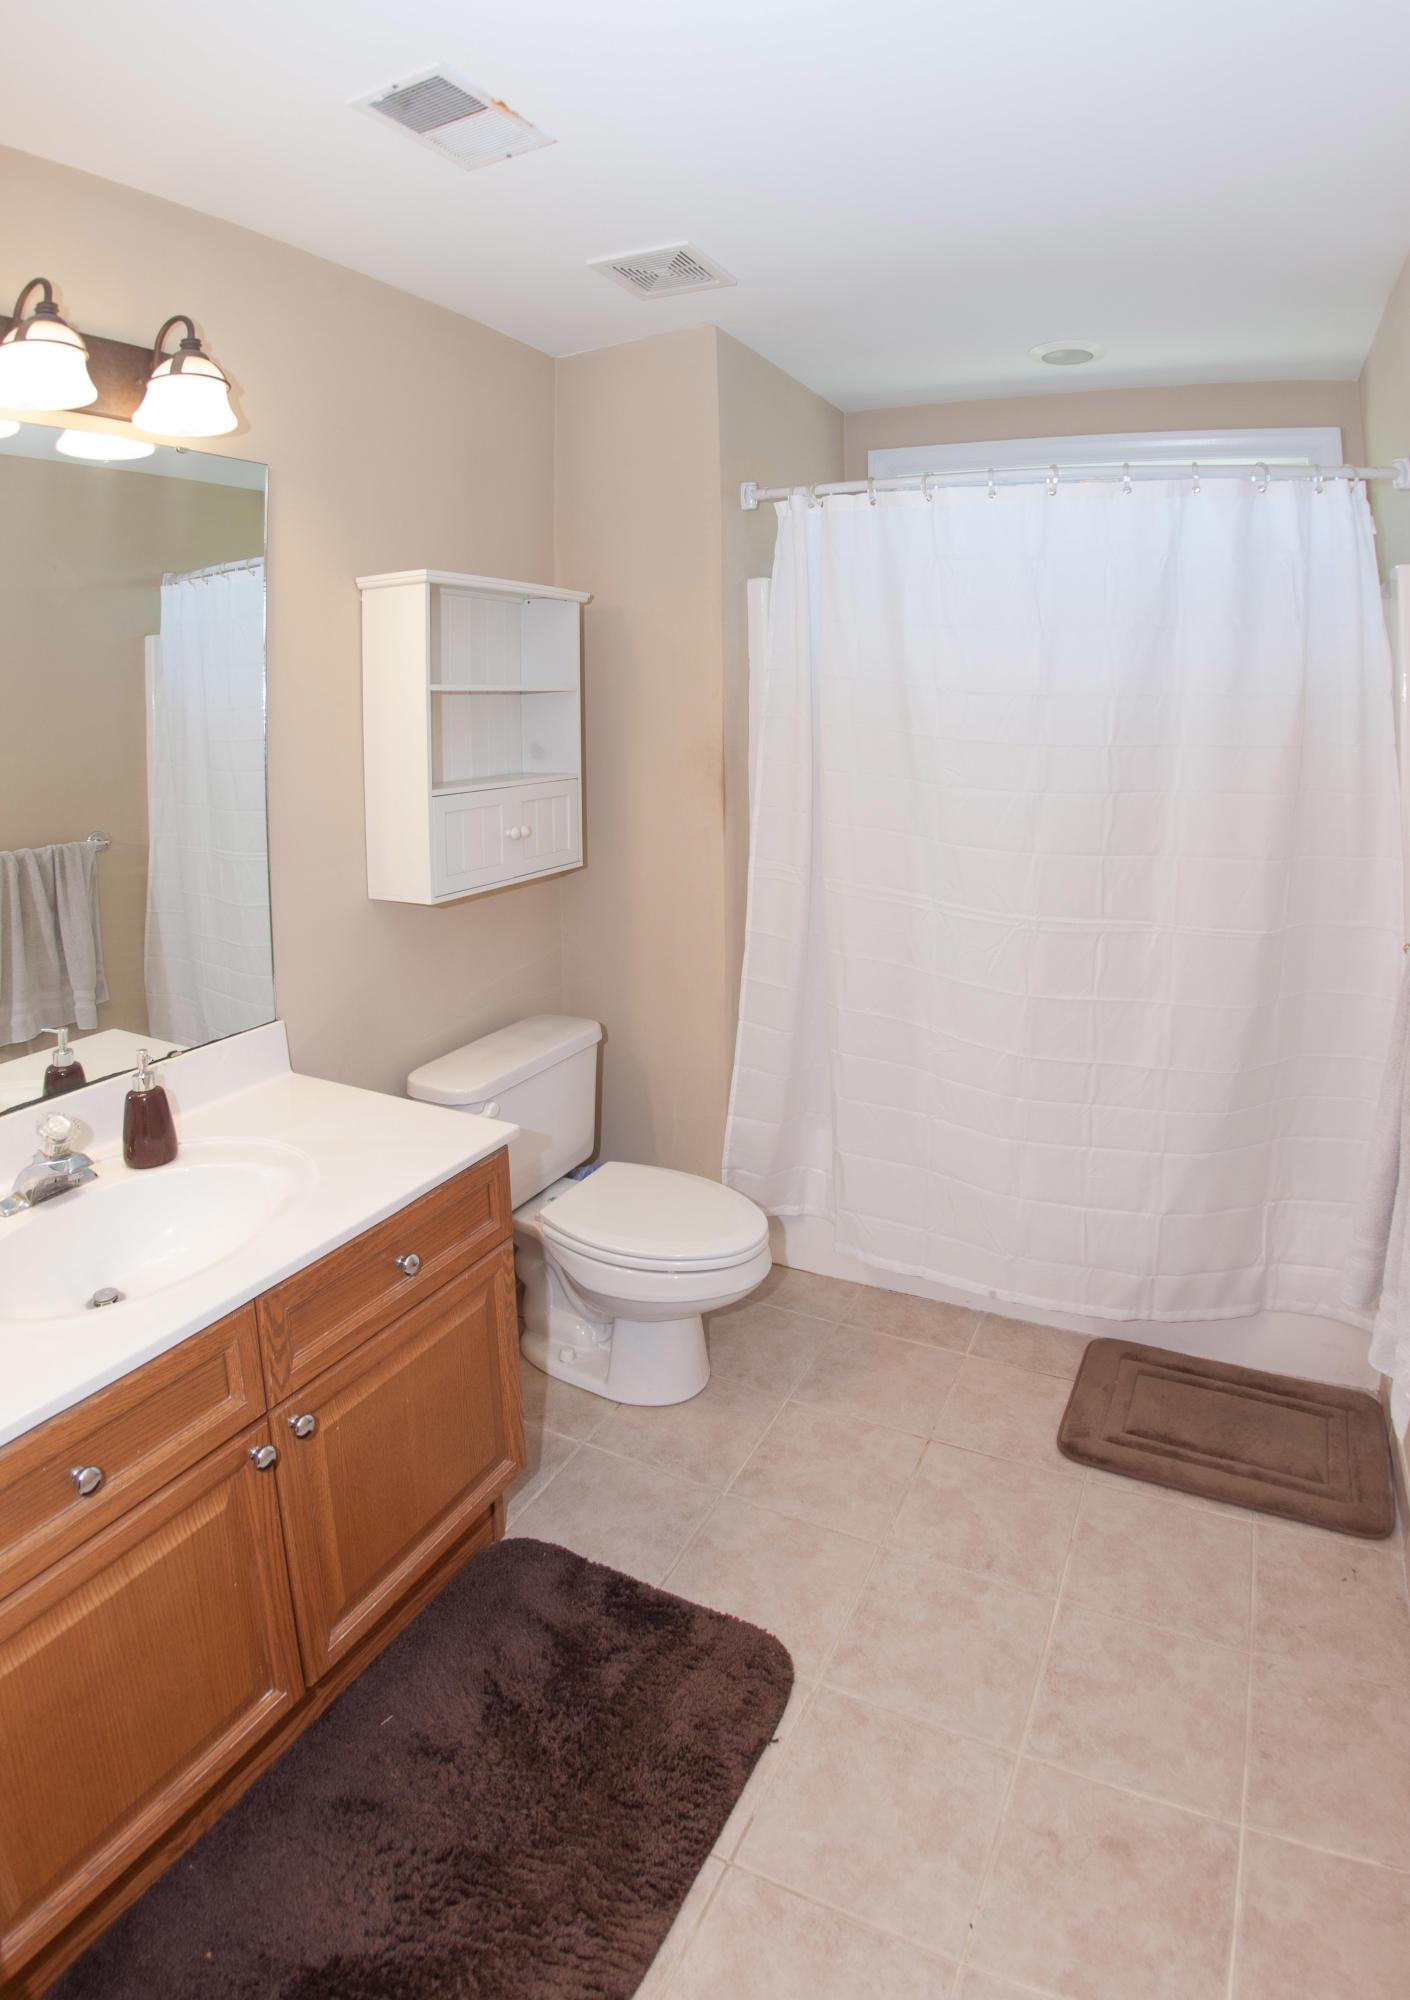 Dunes West Homes For Sale - 2520 Deer Walk, Mount Pleasant, SC - 50